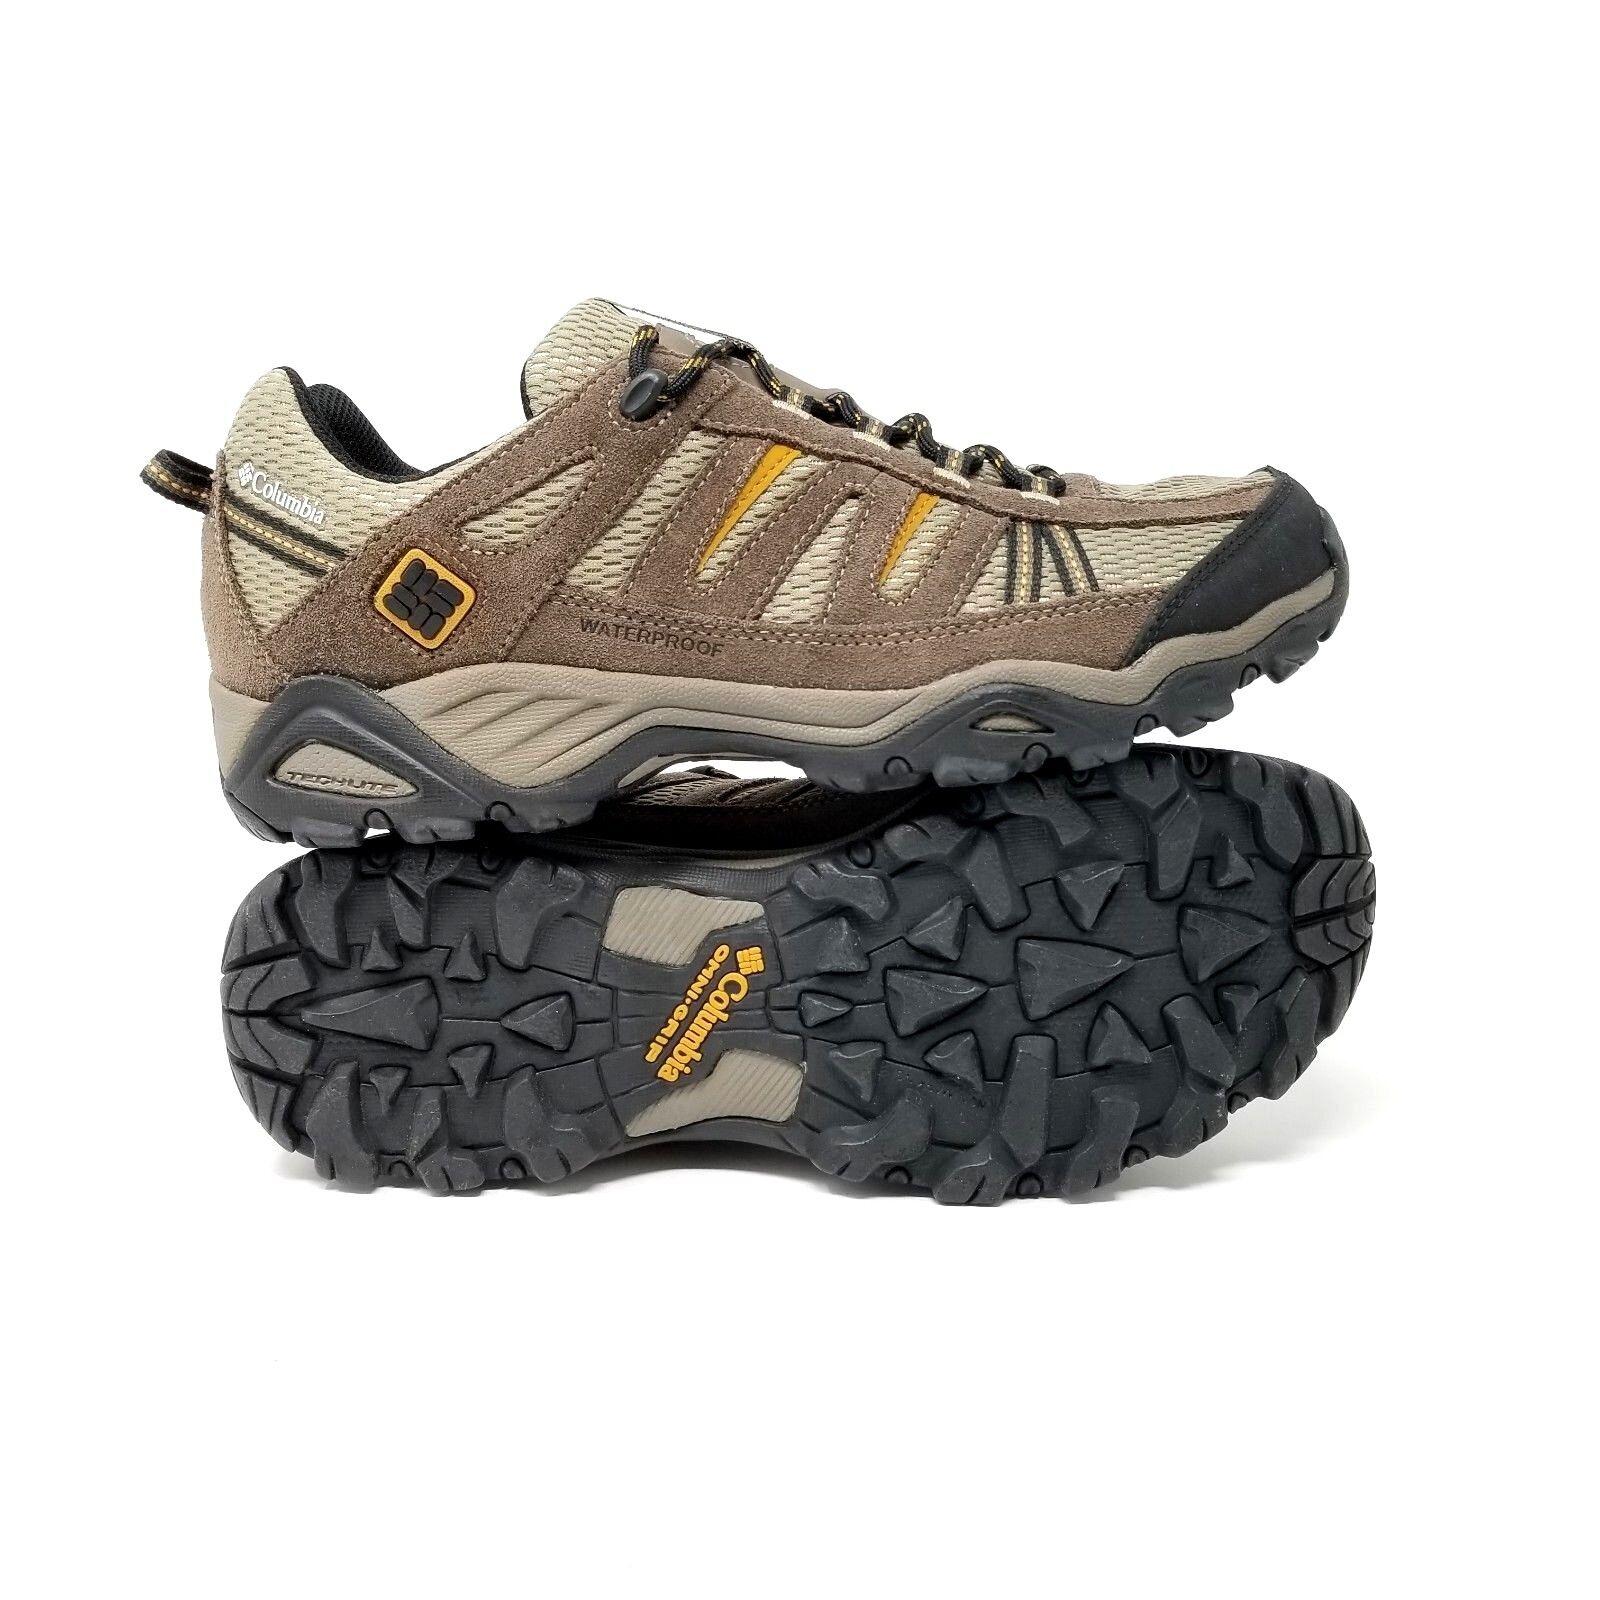 Columbia Para Hombre North Plains Impermeable Zapatos De Gamuza Cuero Excursionista BM3896 Talla 11.5